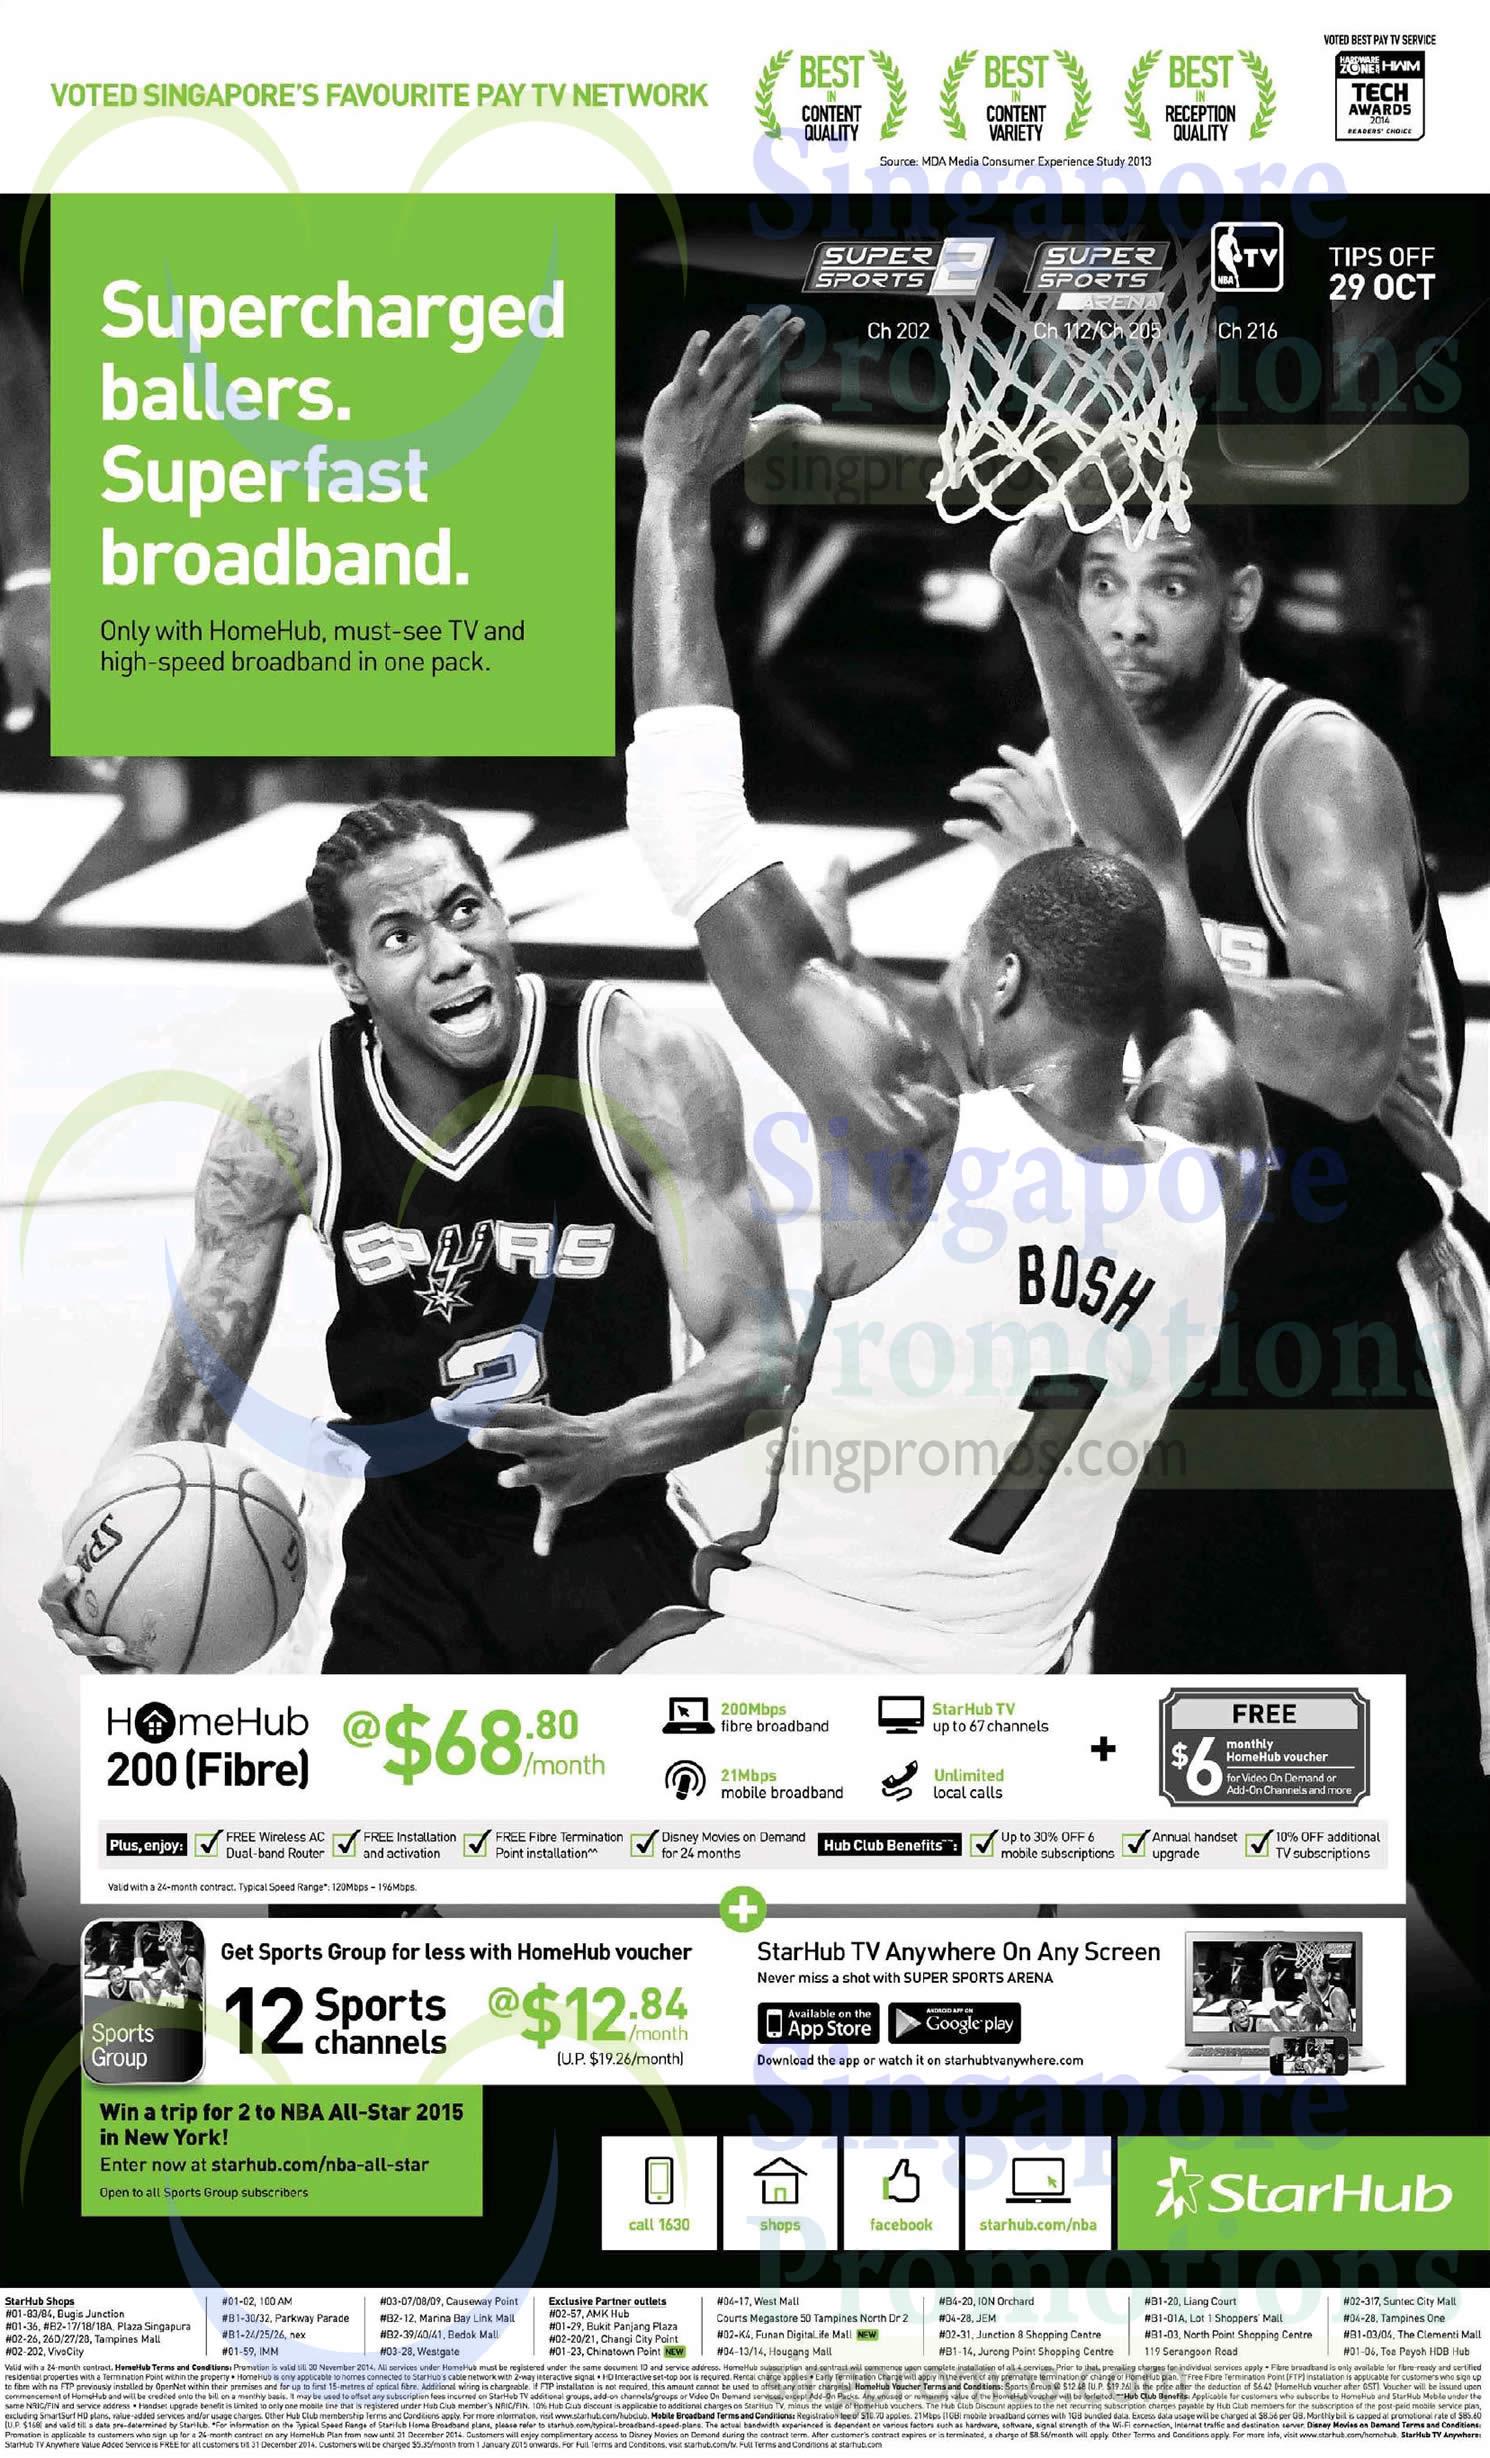 68.80 HomeHub 200 Fibre, 12.84 Sports Group Pack